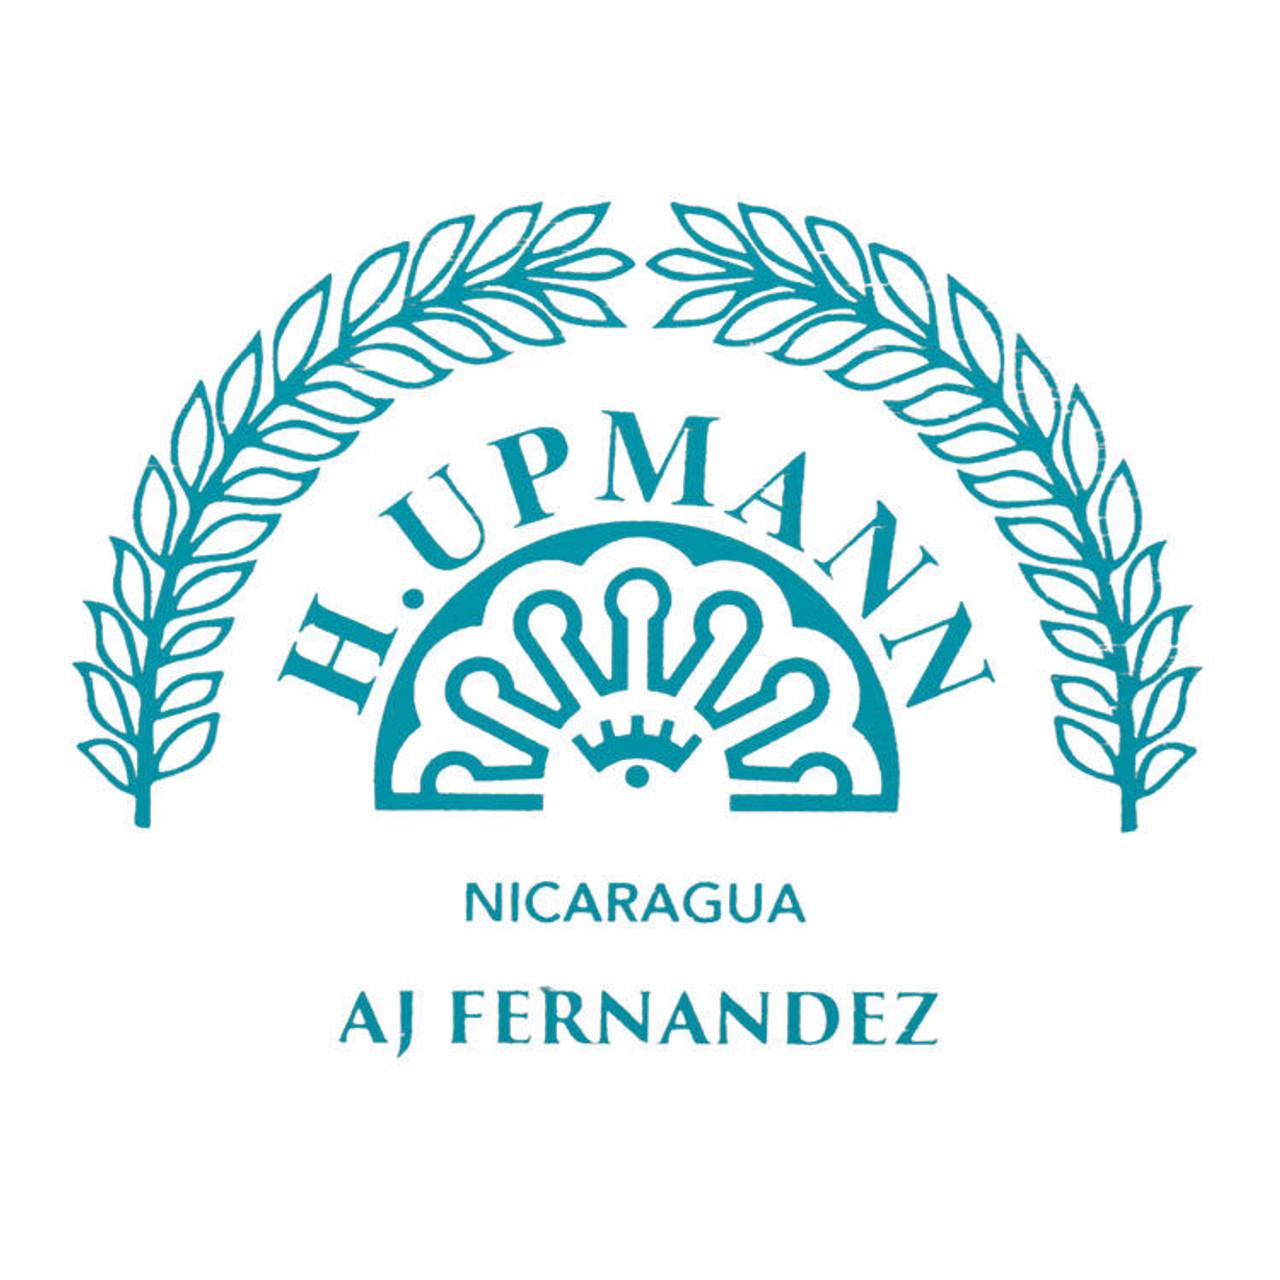 H. Upmann by AJ Fernandez Toro Tube Cigars - 6.0 x 54 (Box of 20)